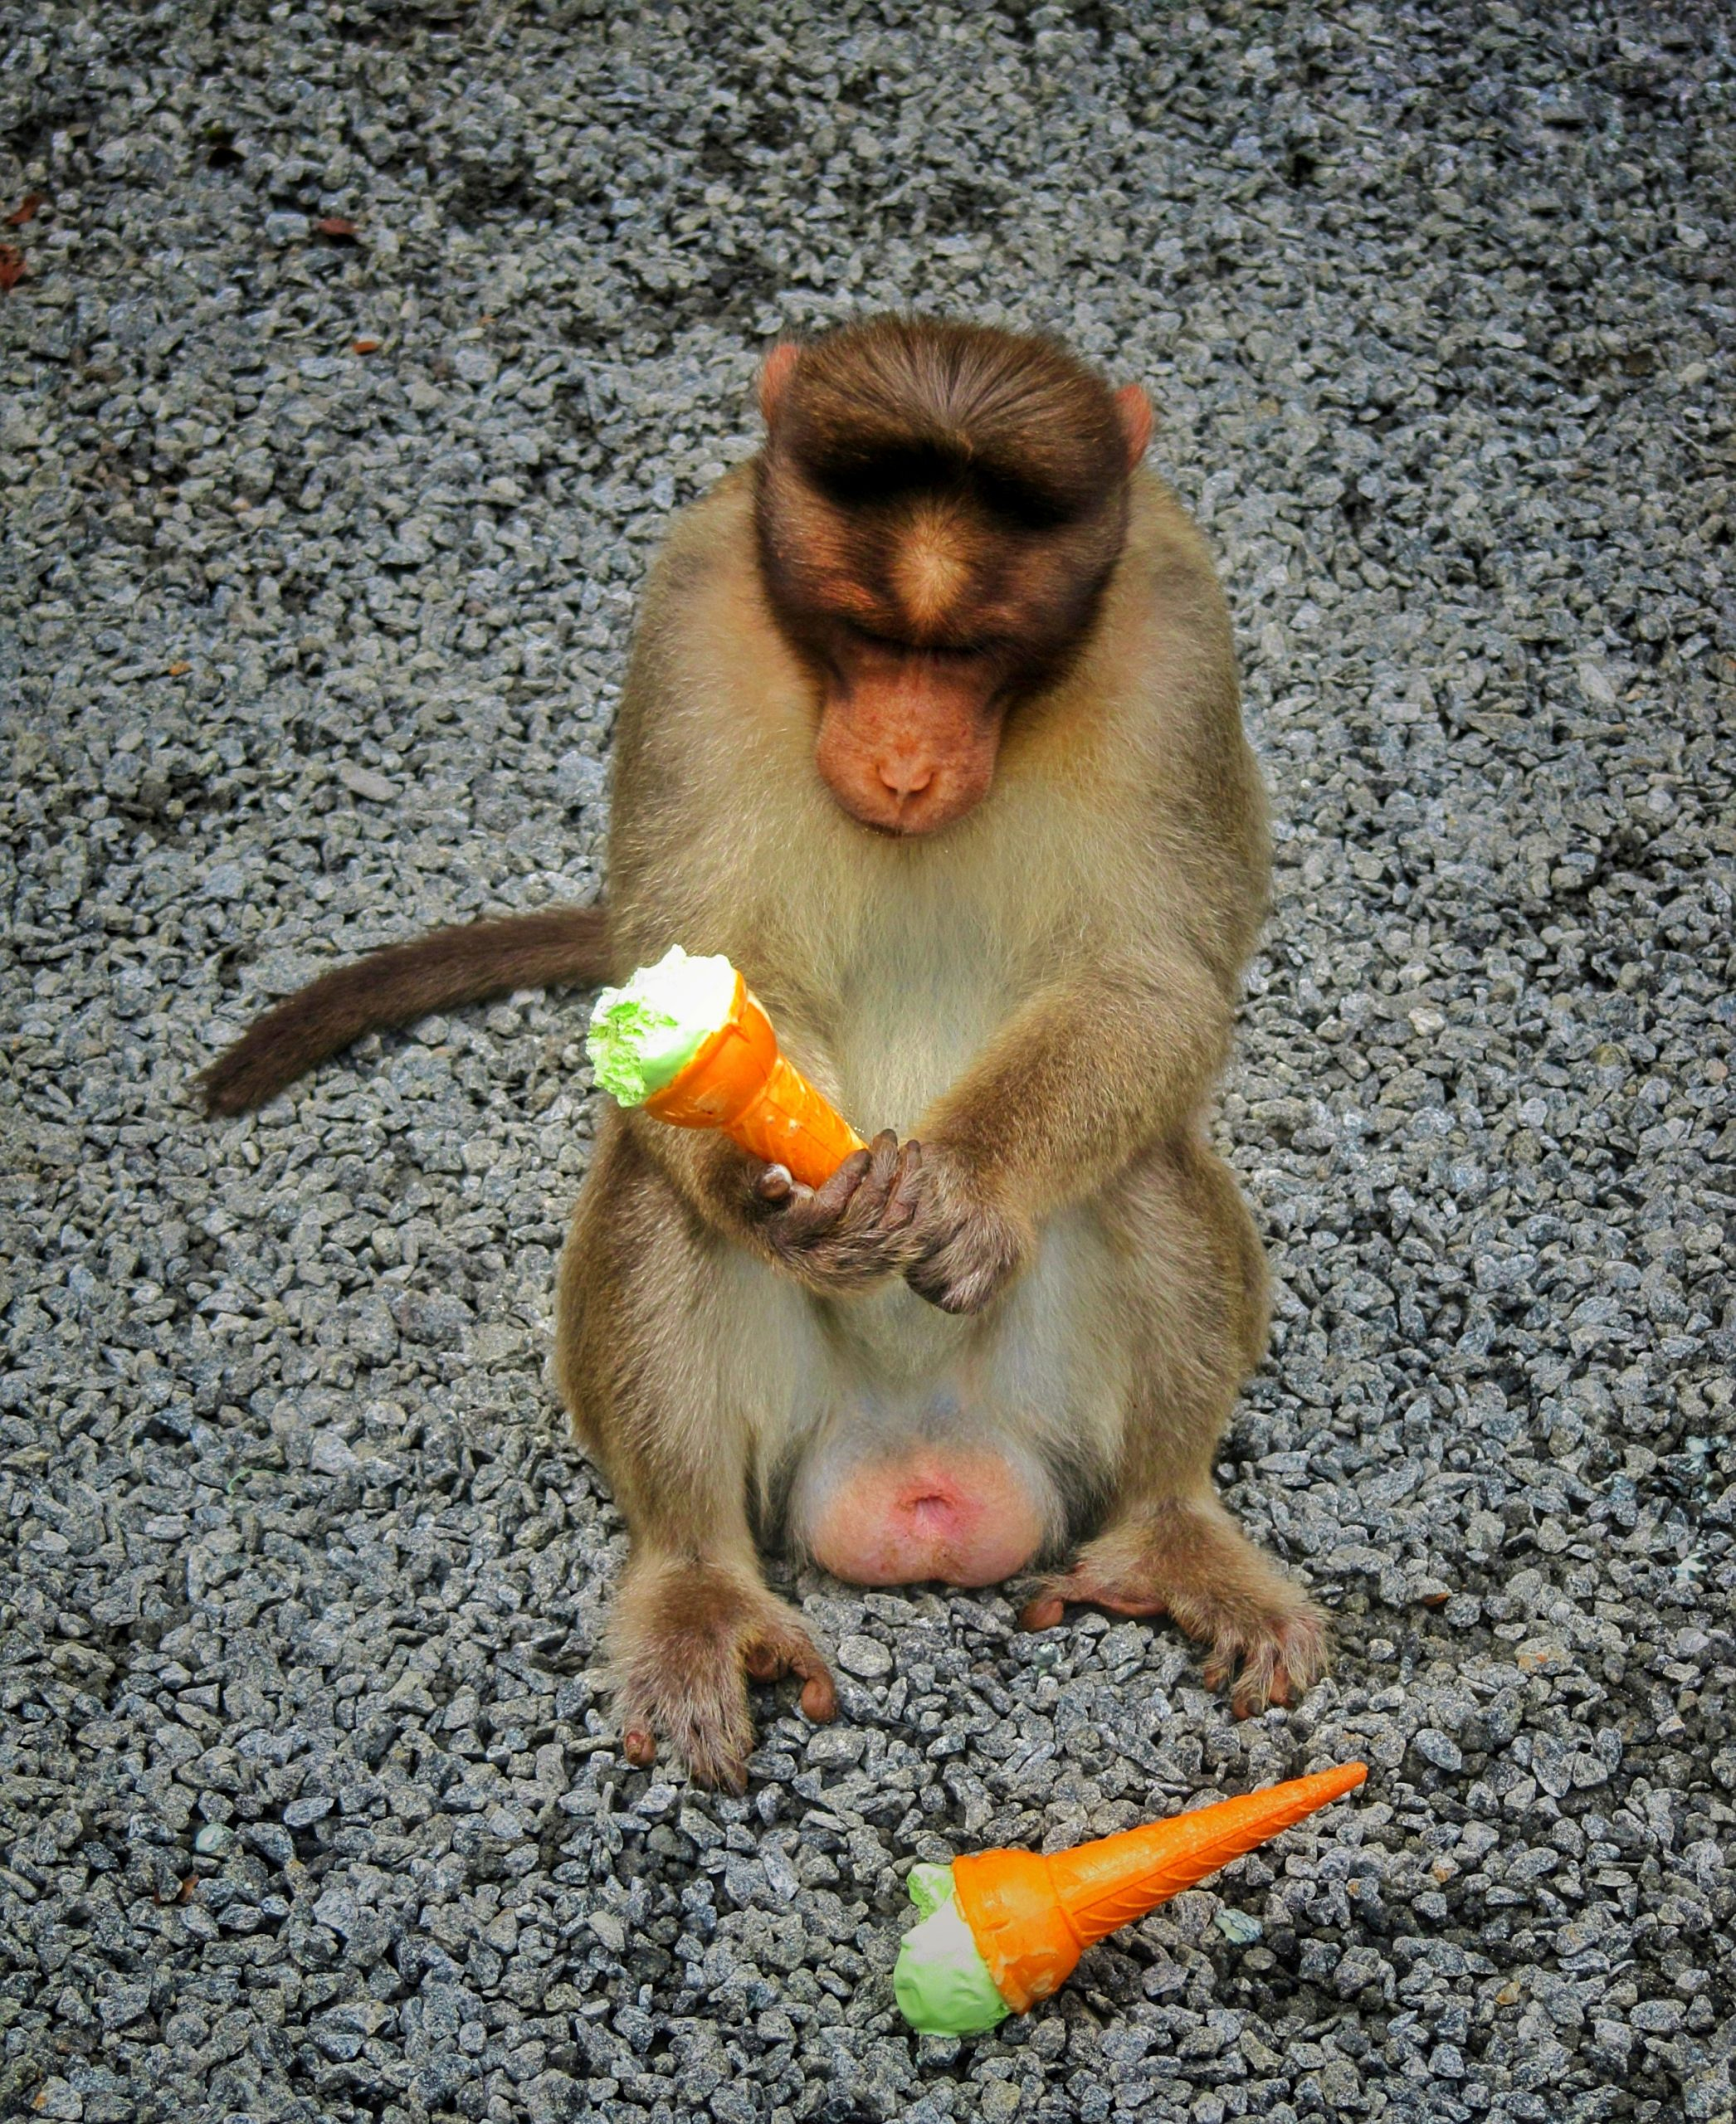 Monkey holding ice cream